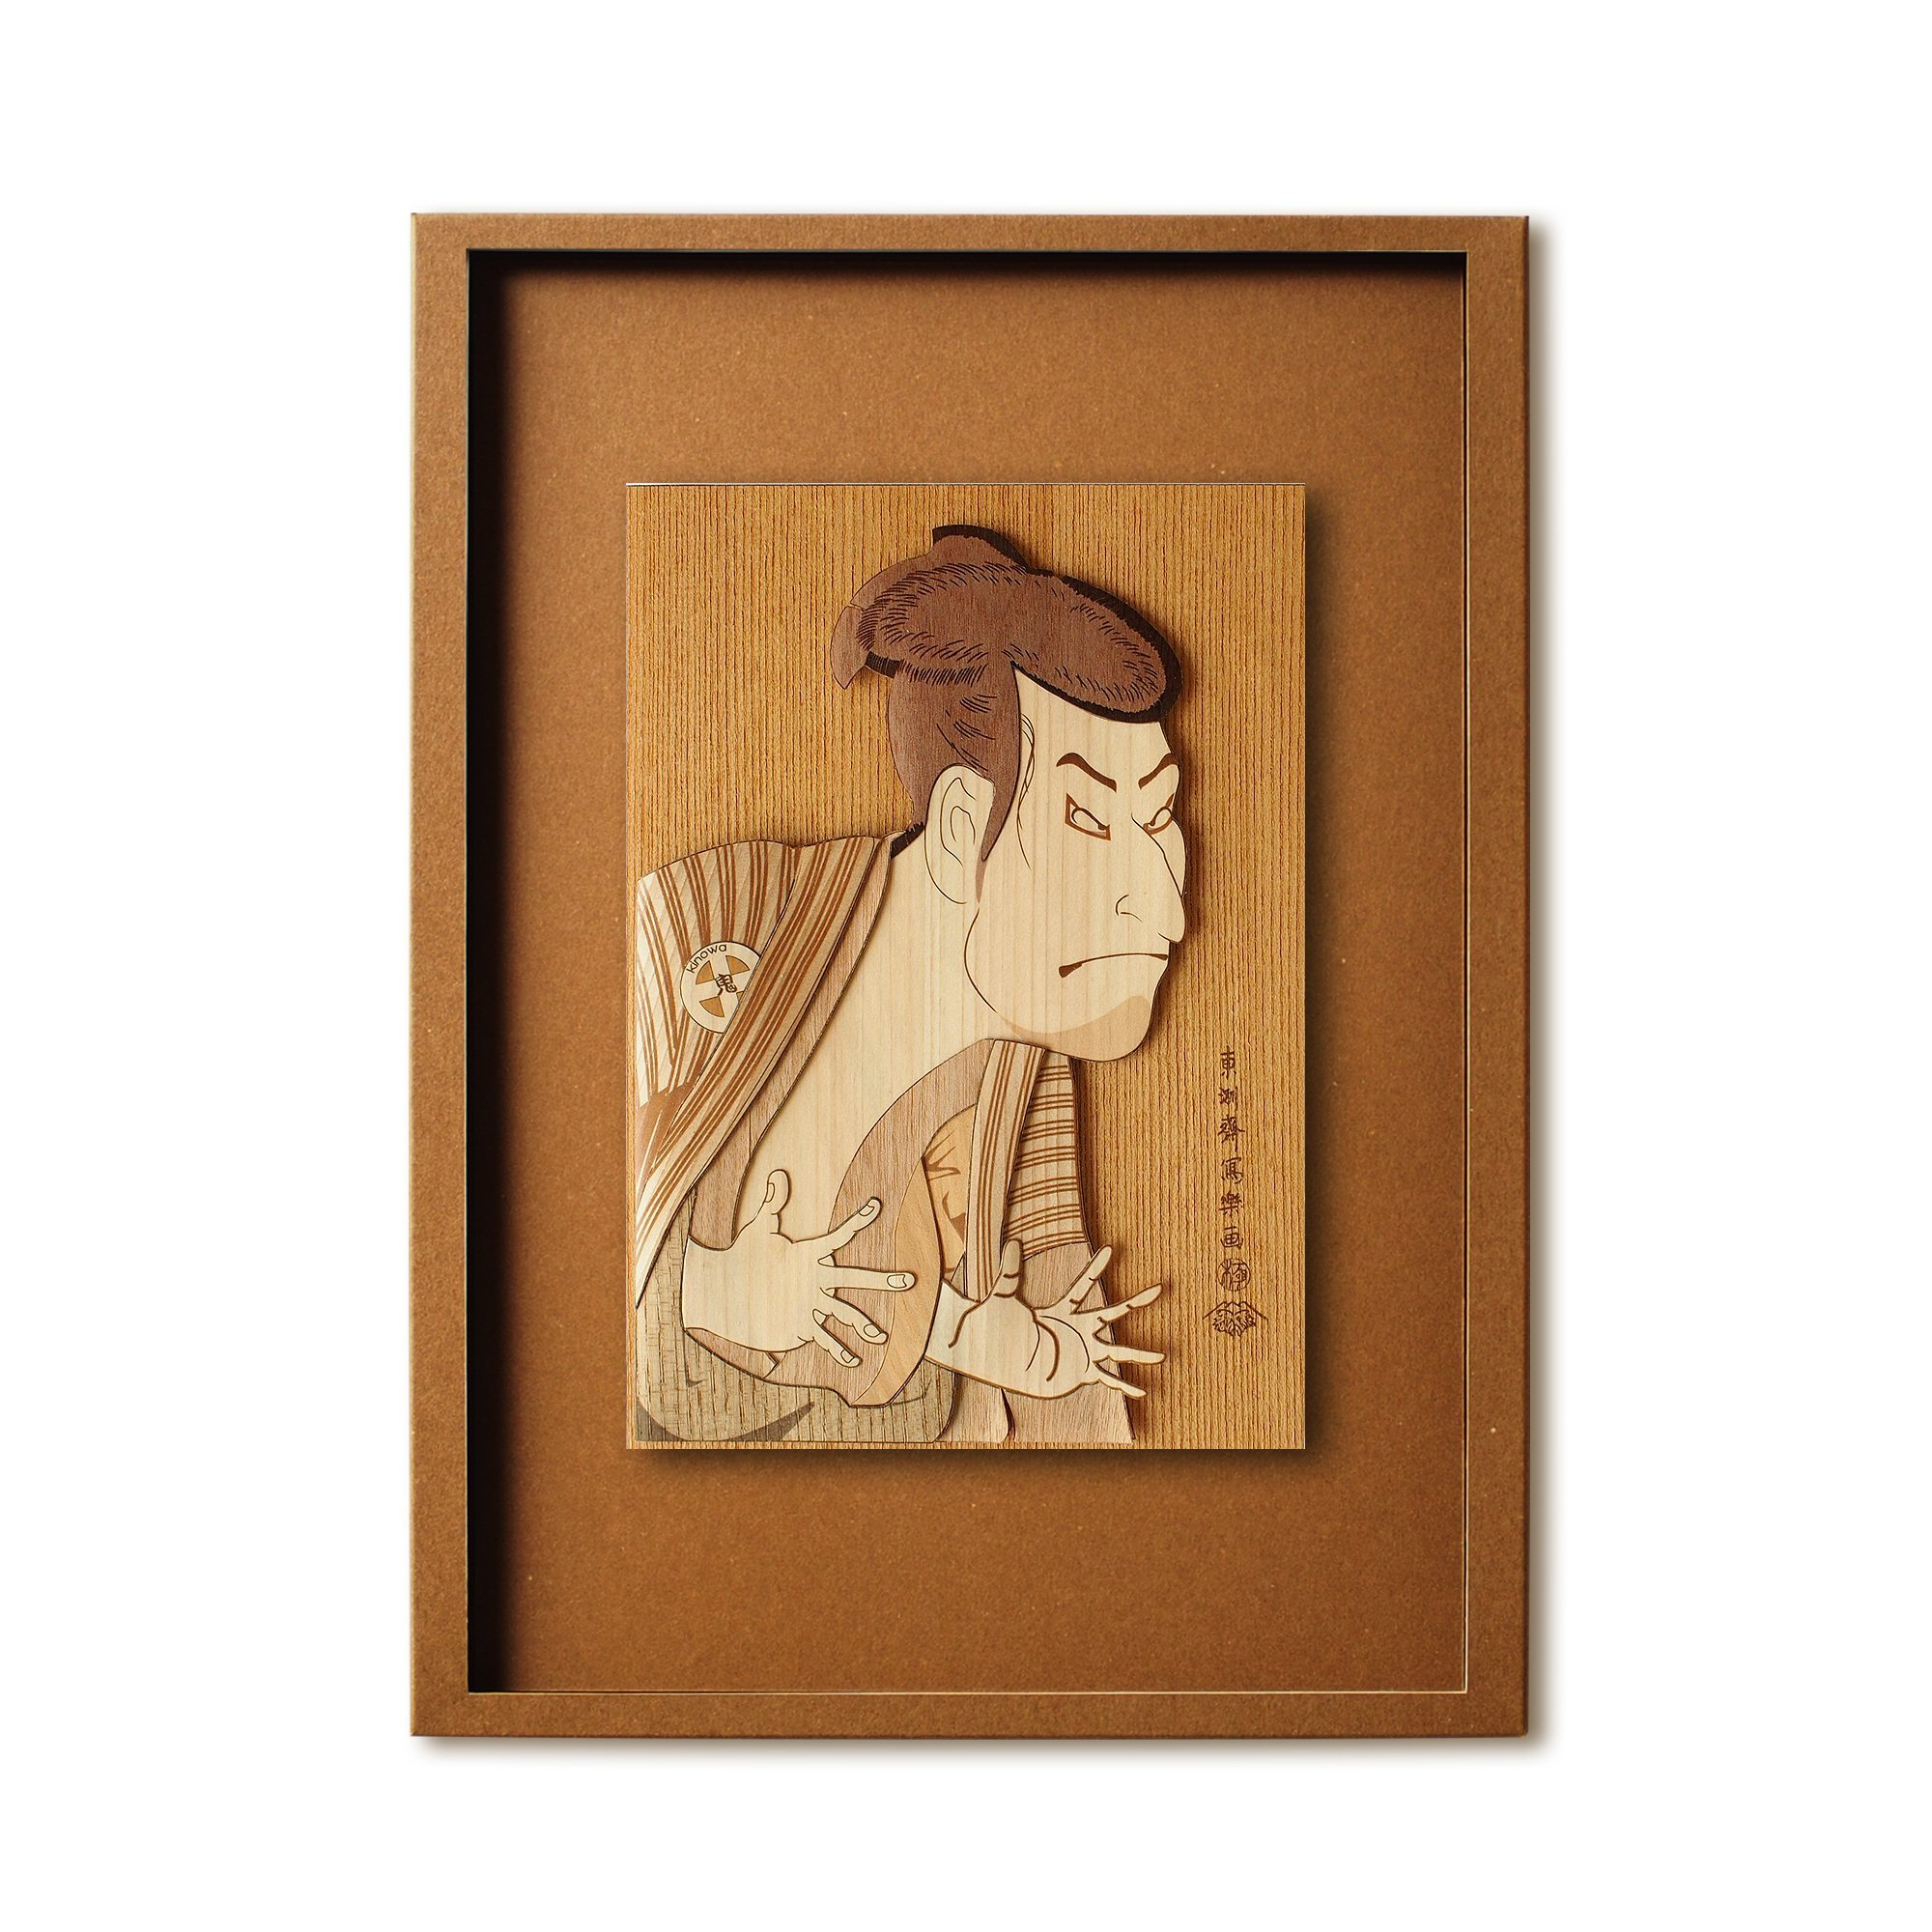 KINOWA Ukiyoe Art Kit Kiharie Actor Otani Oniji 3rd As The Yakko Edobei Made in Japan by KINOWA